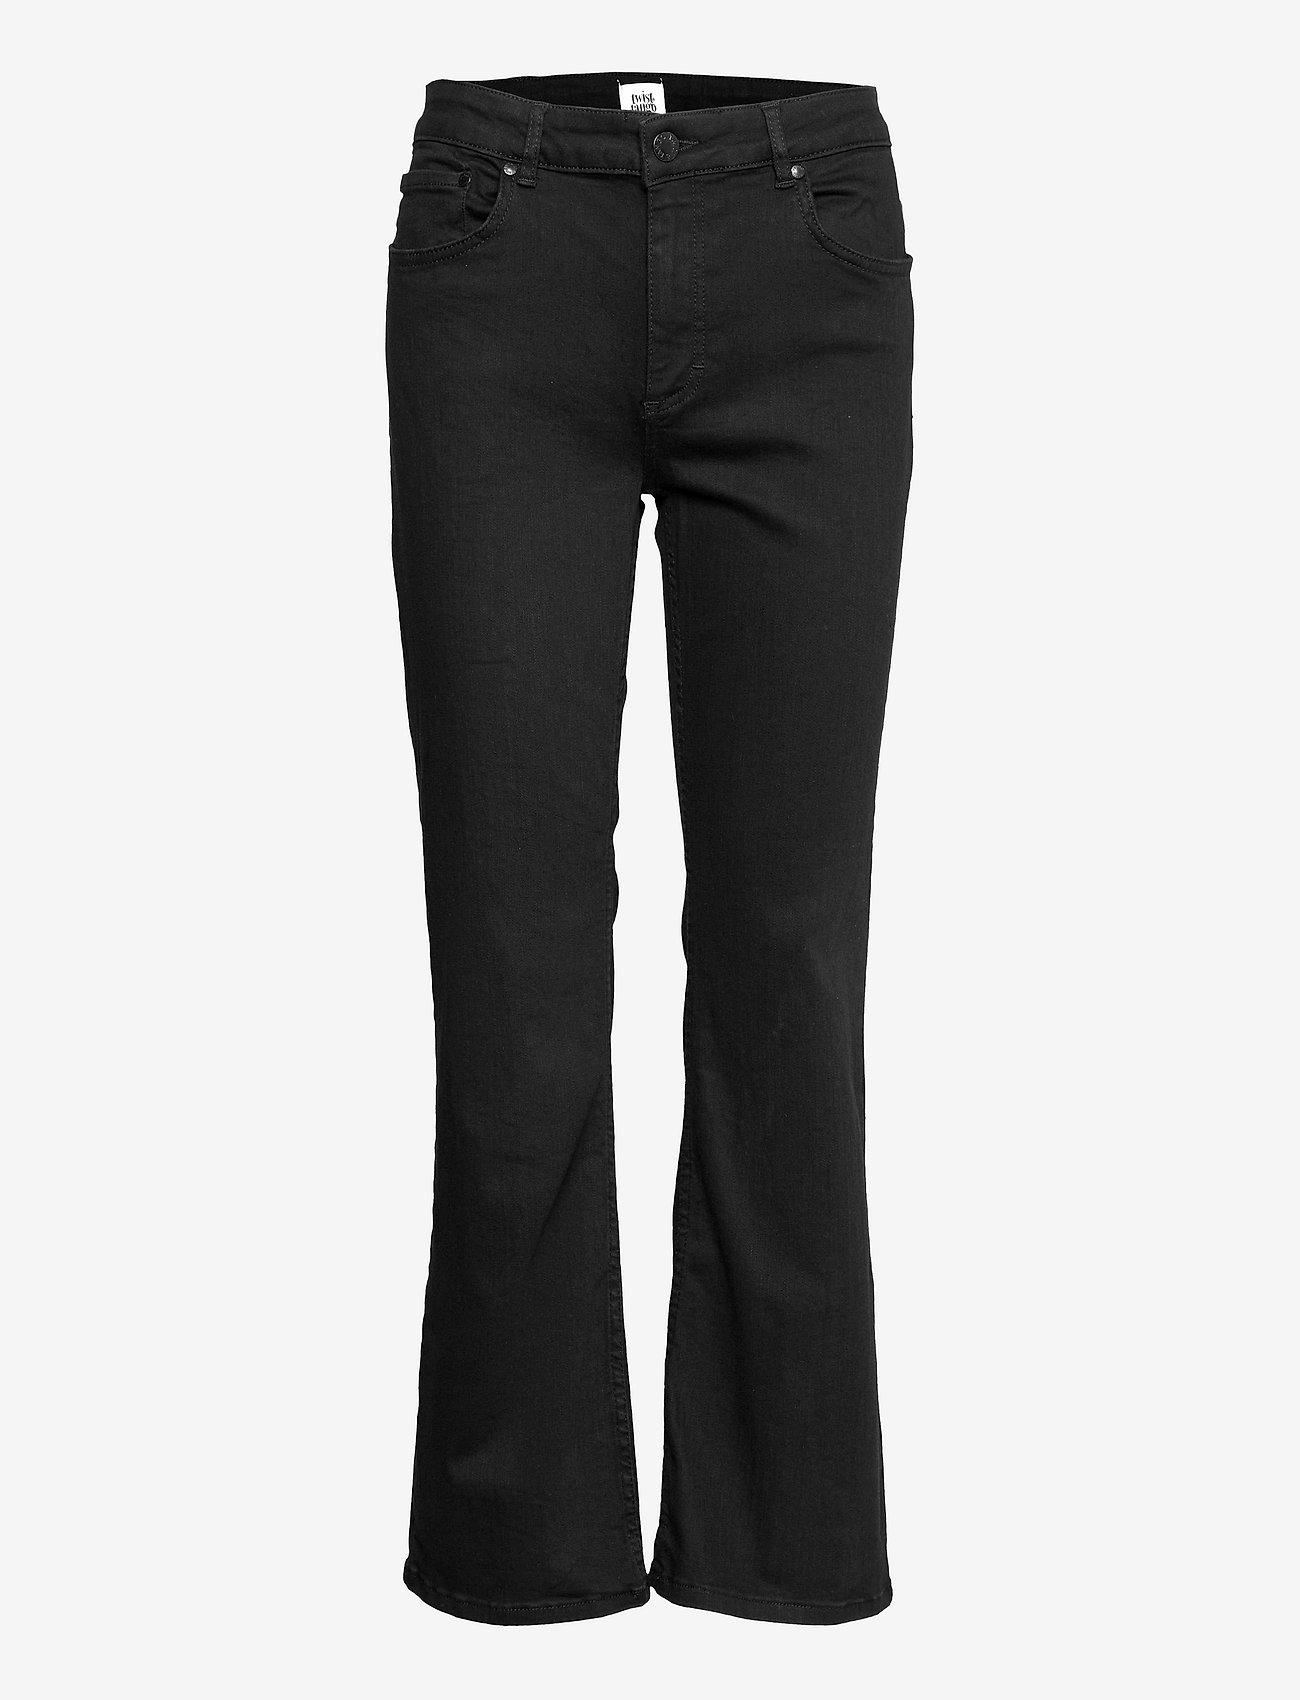 Twist & Tango - Jo Jeans Skinny - schlaghosen - skinny black - 0